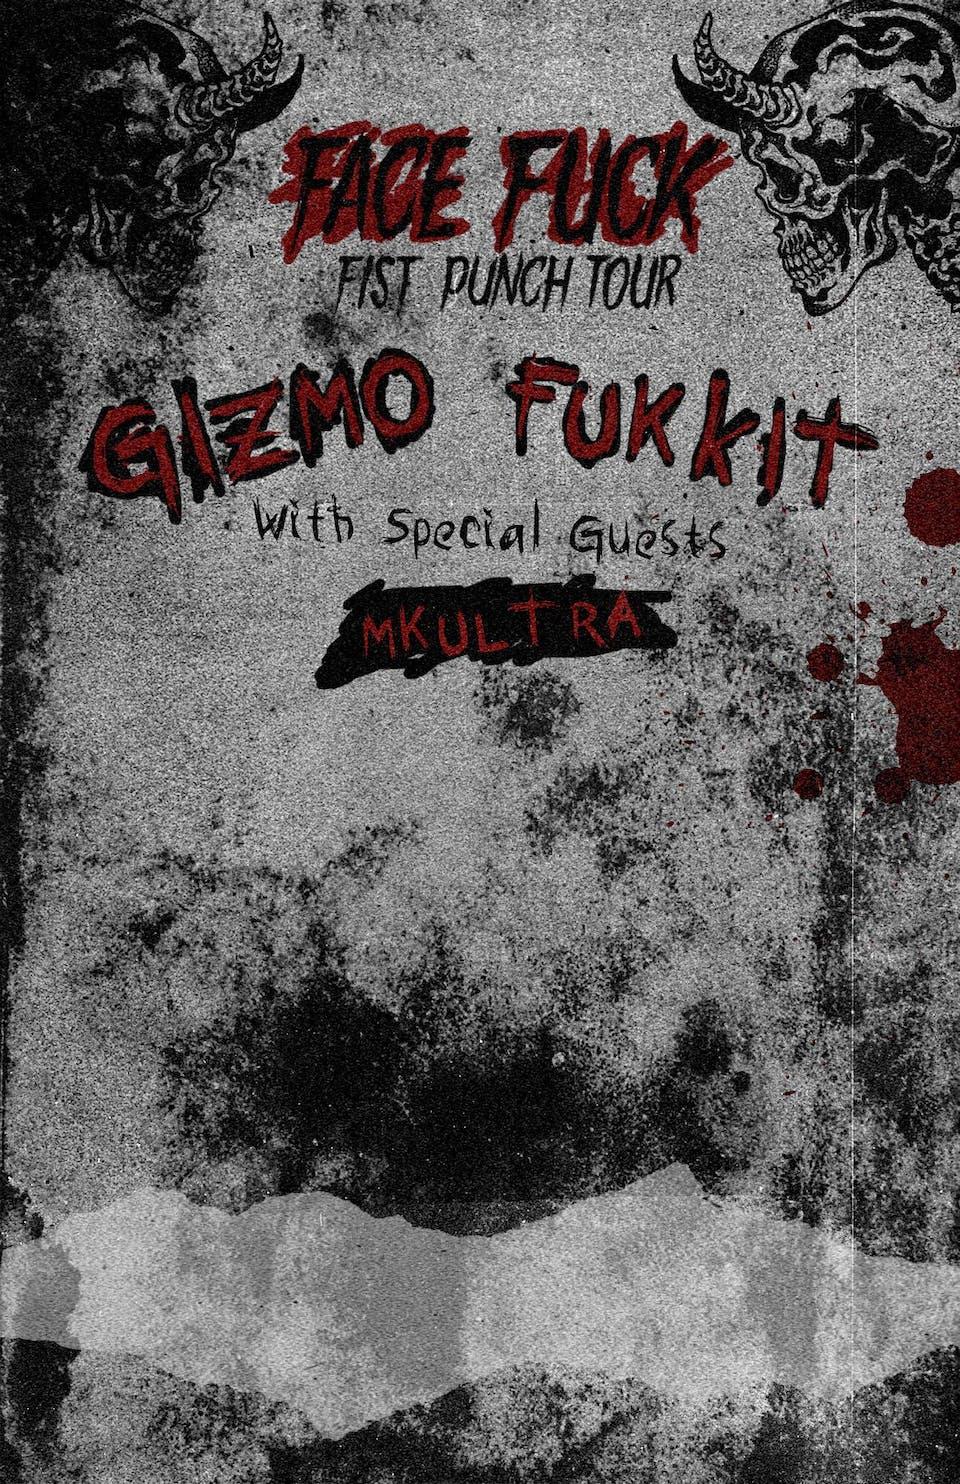 Fukkit + Gizmo